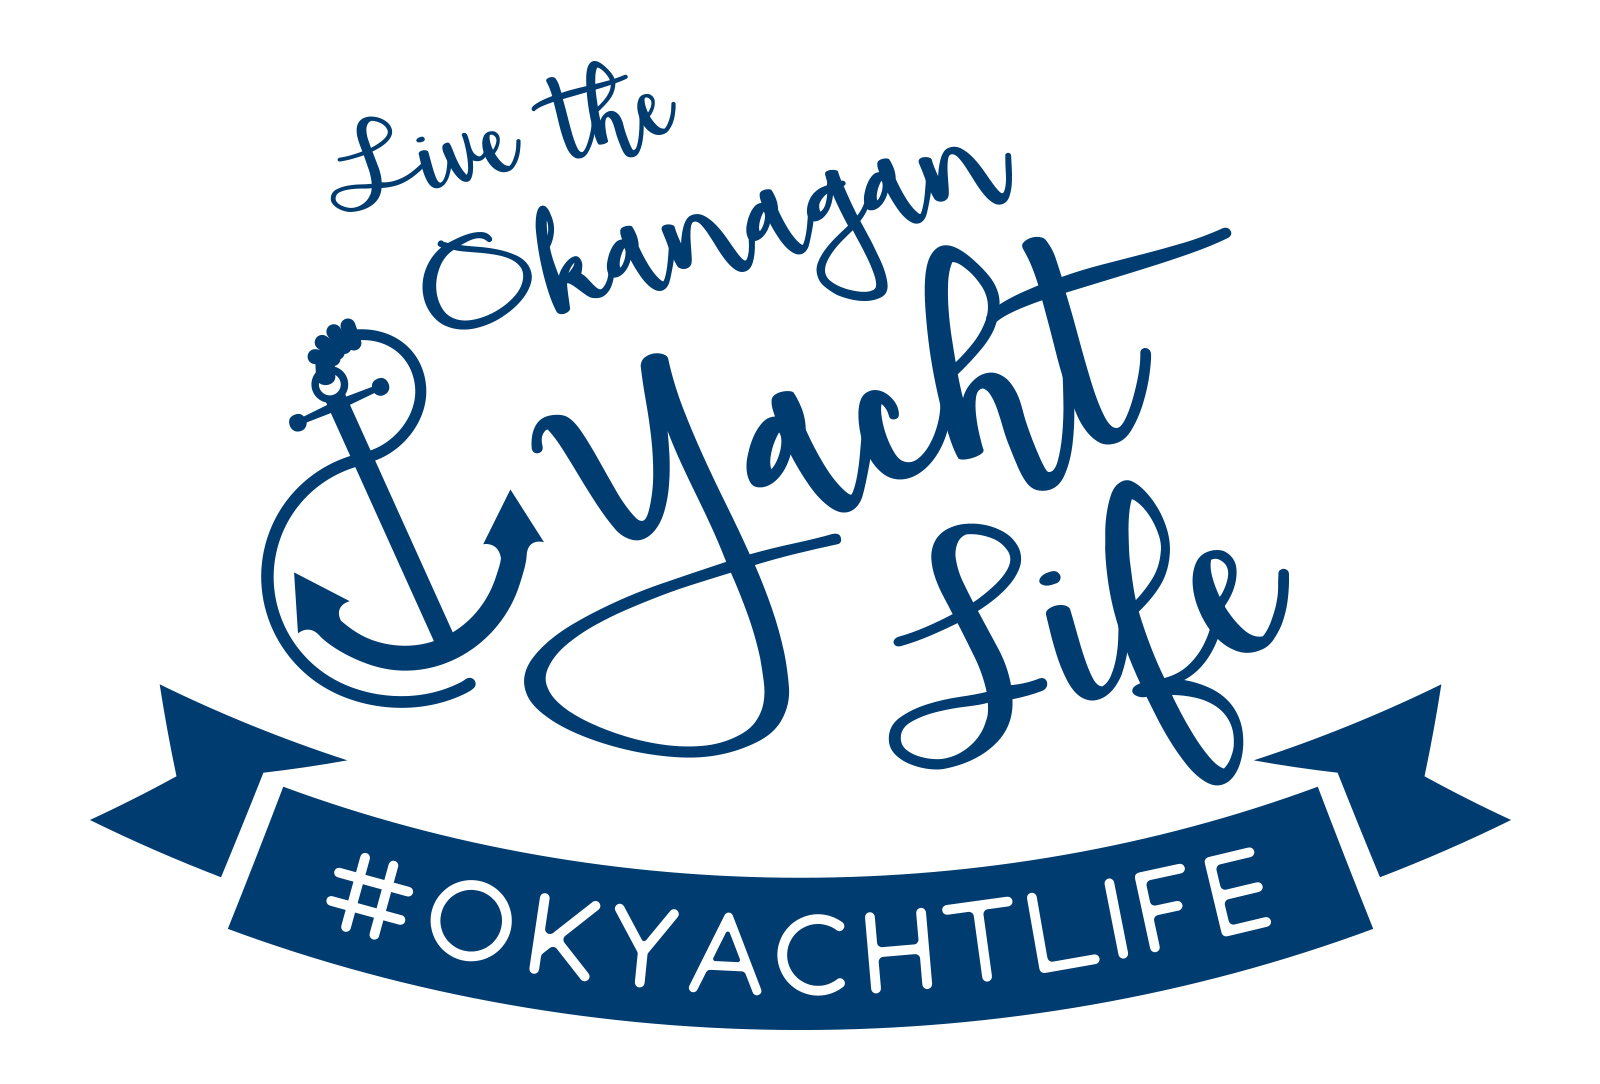 OK Yacht Life Logo.jpg